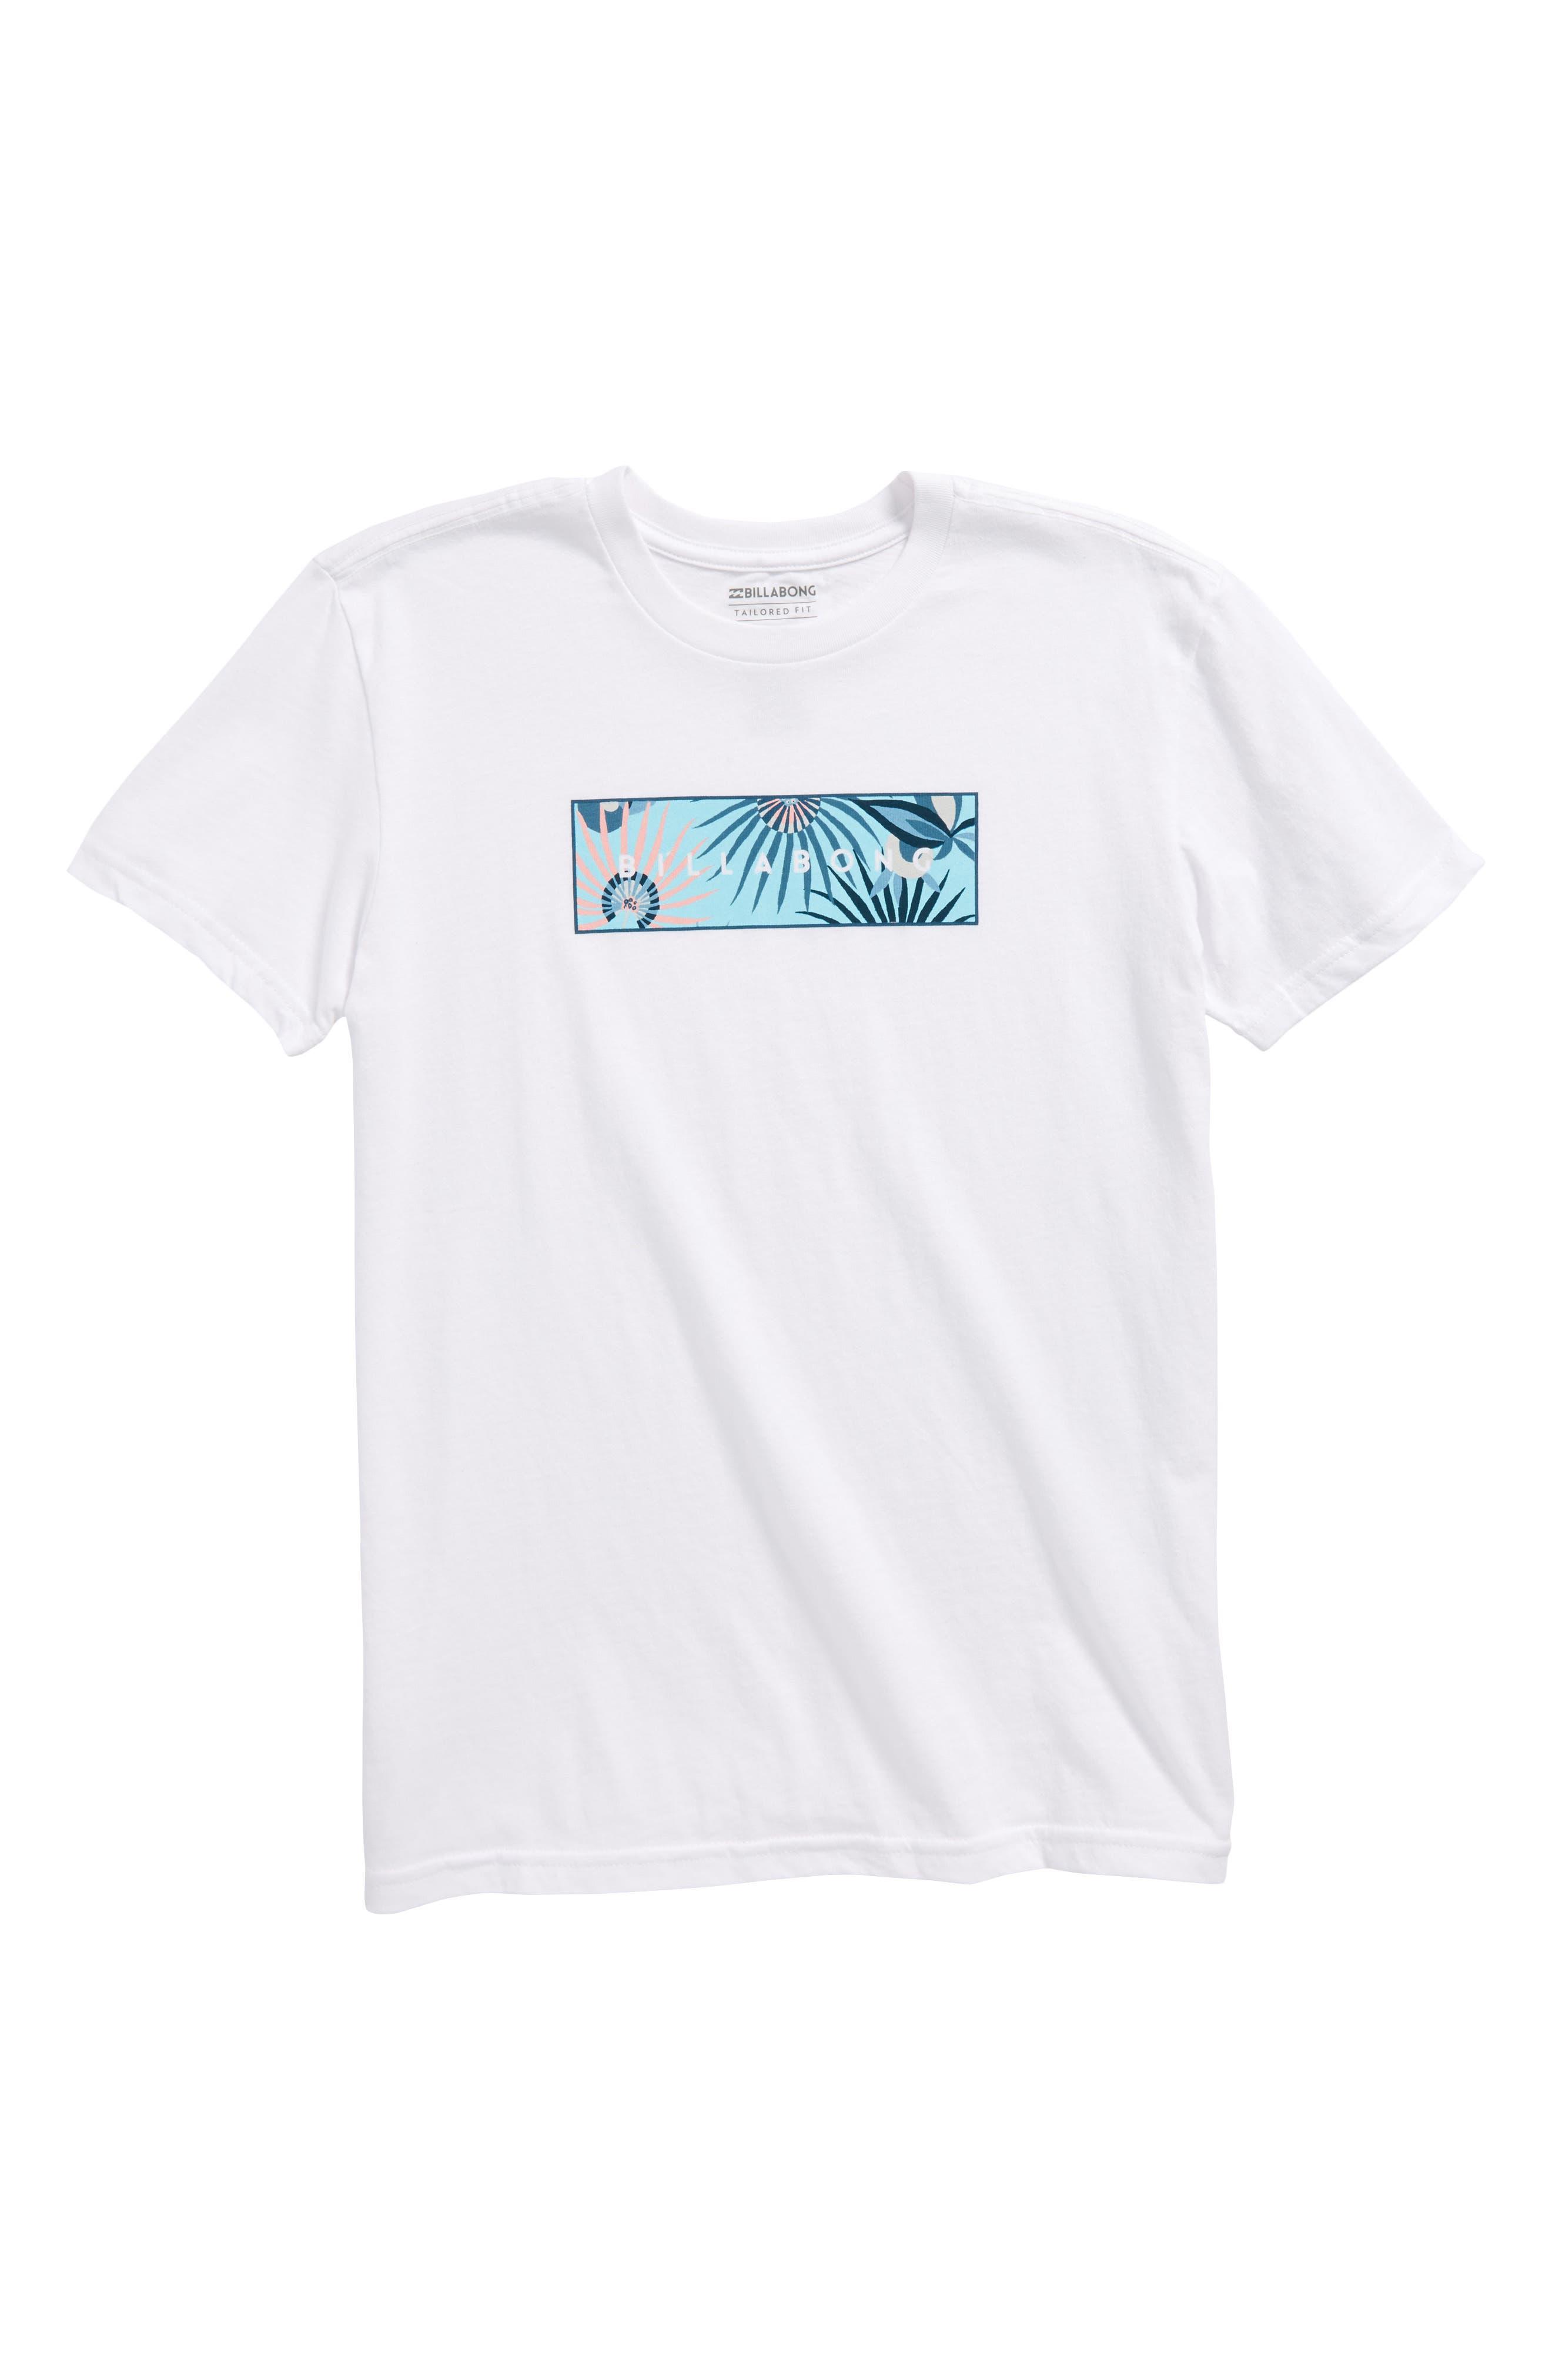 United Graphic T-Shirt,                             Main thumbnail 1, color,                             White